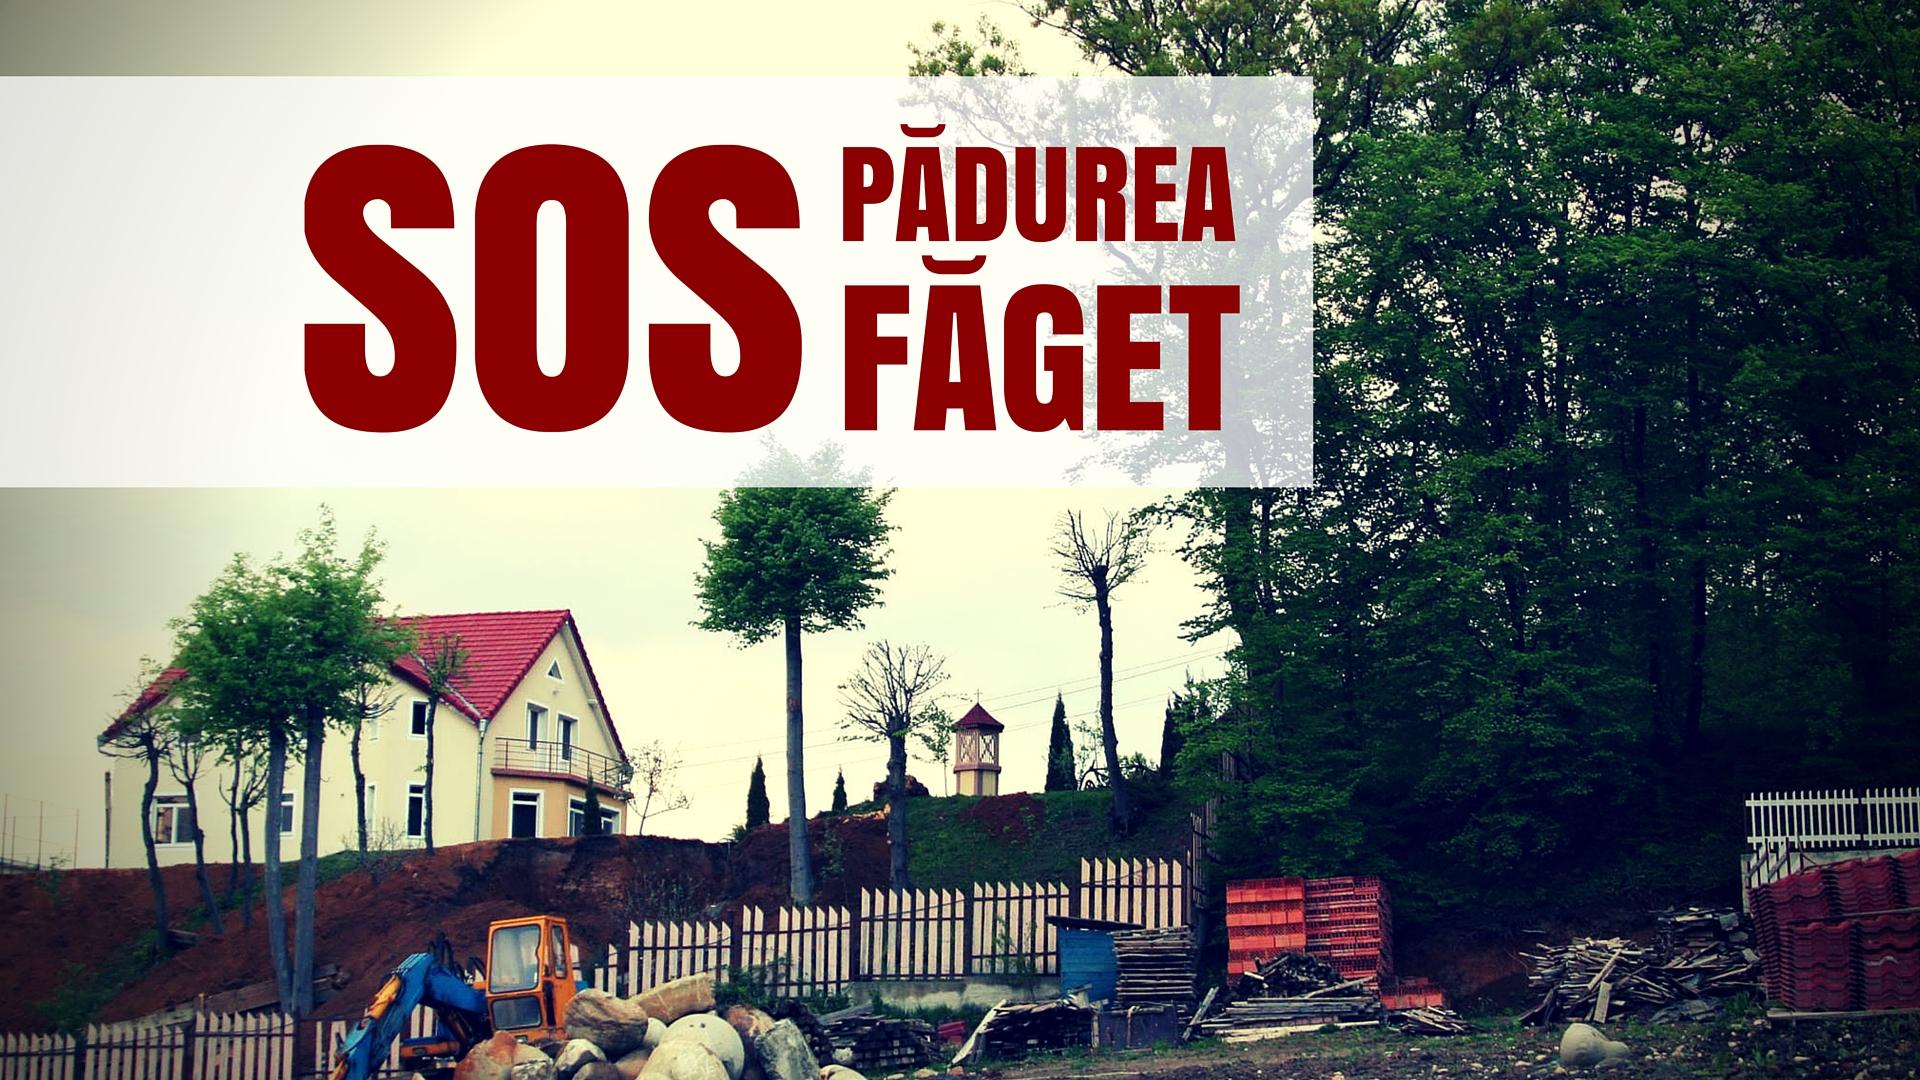 SOS padurea Faget